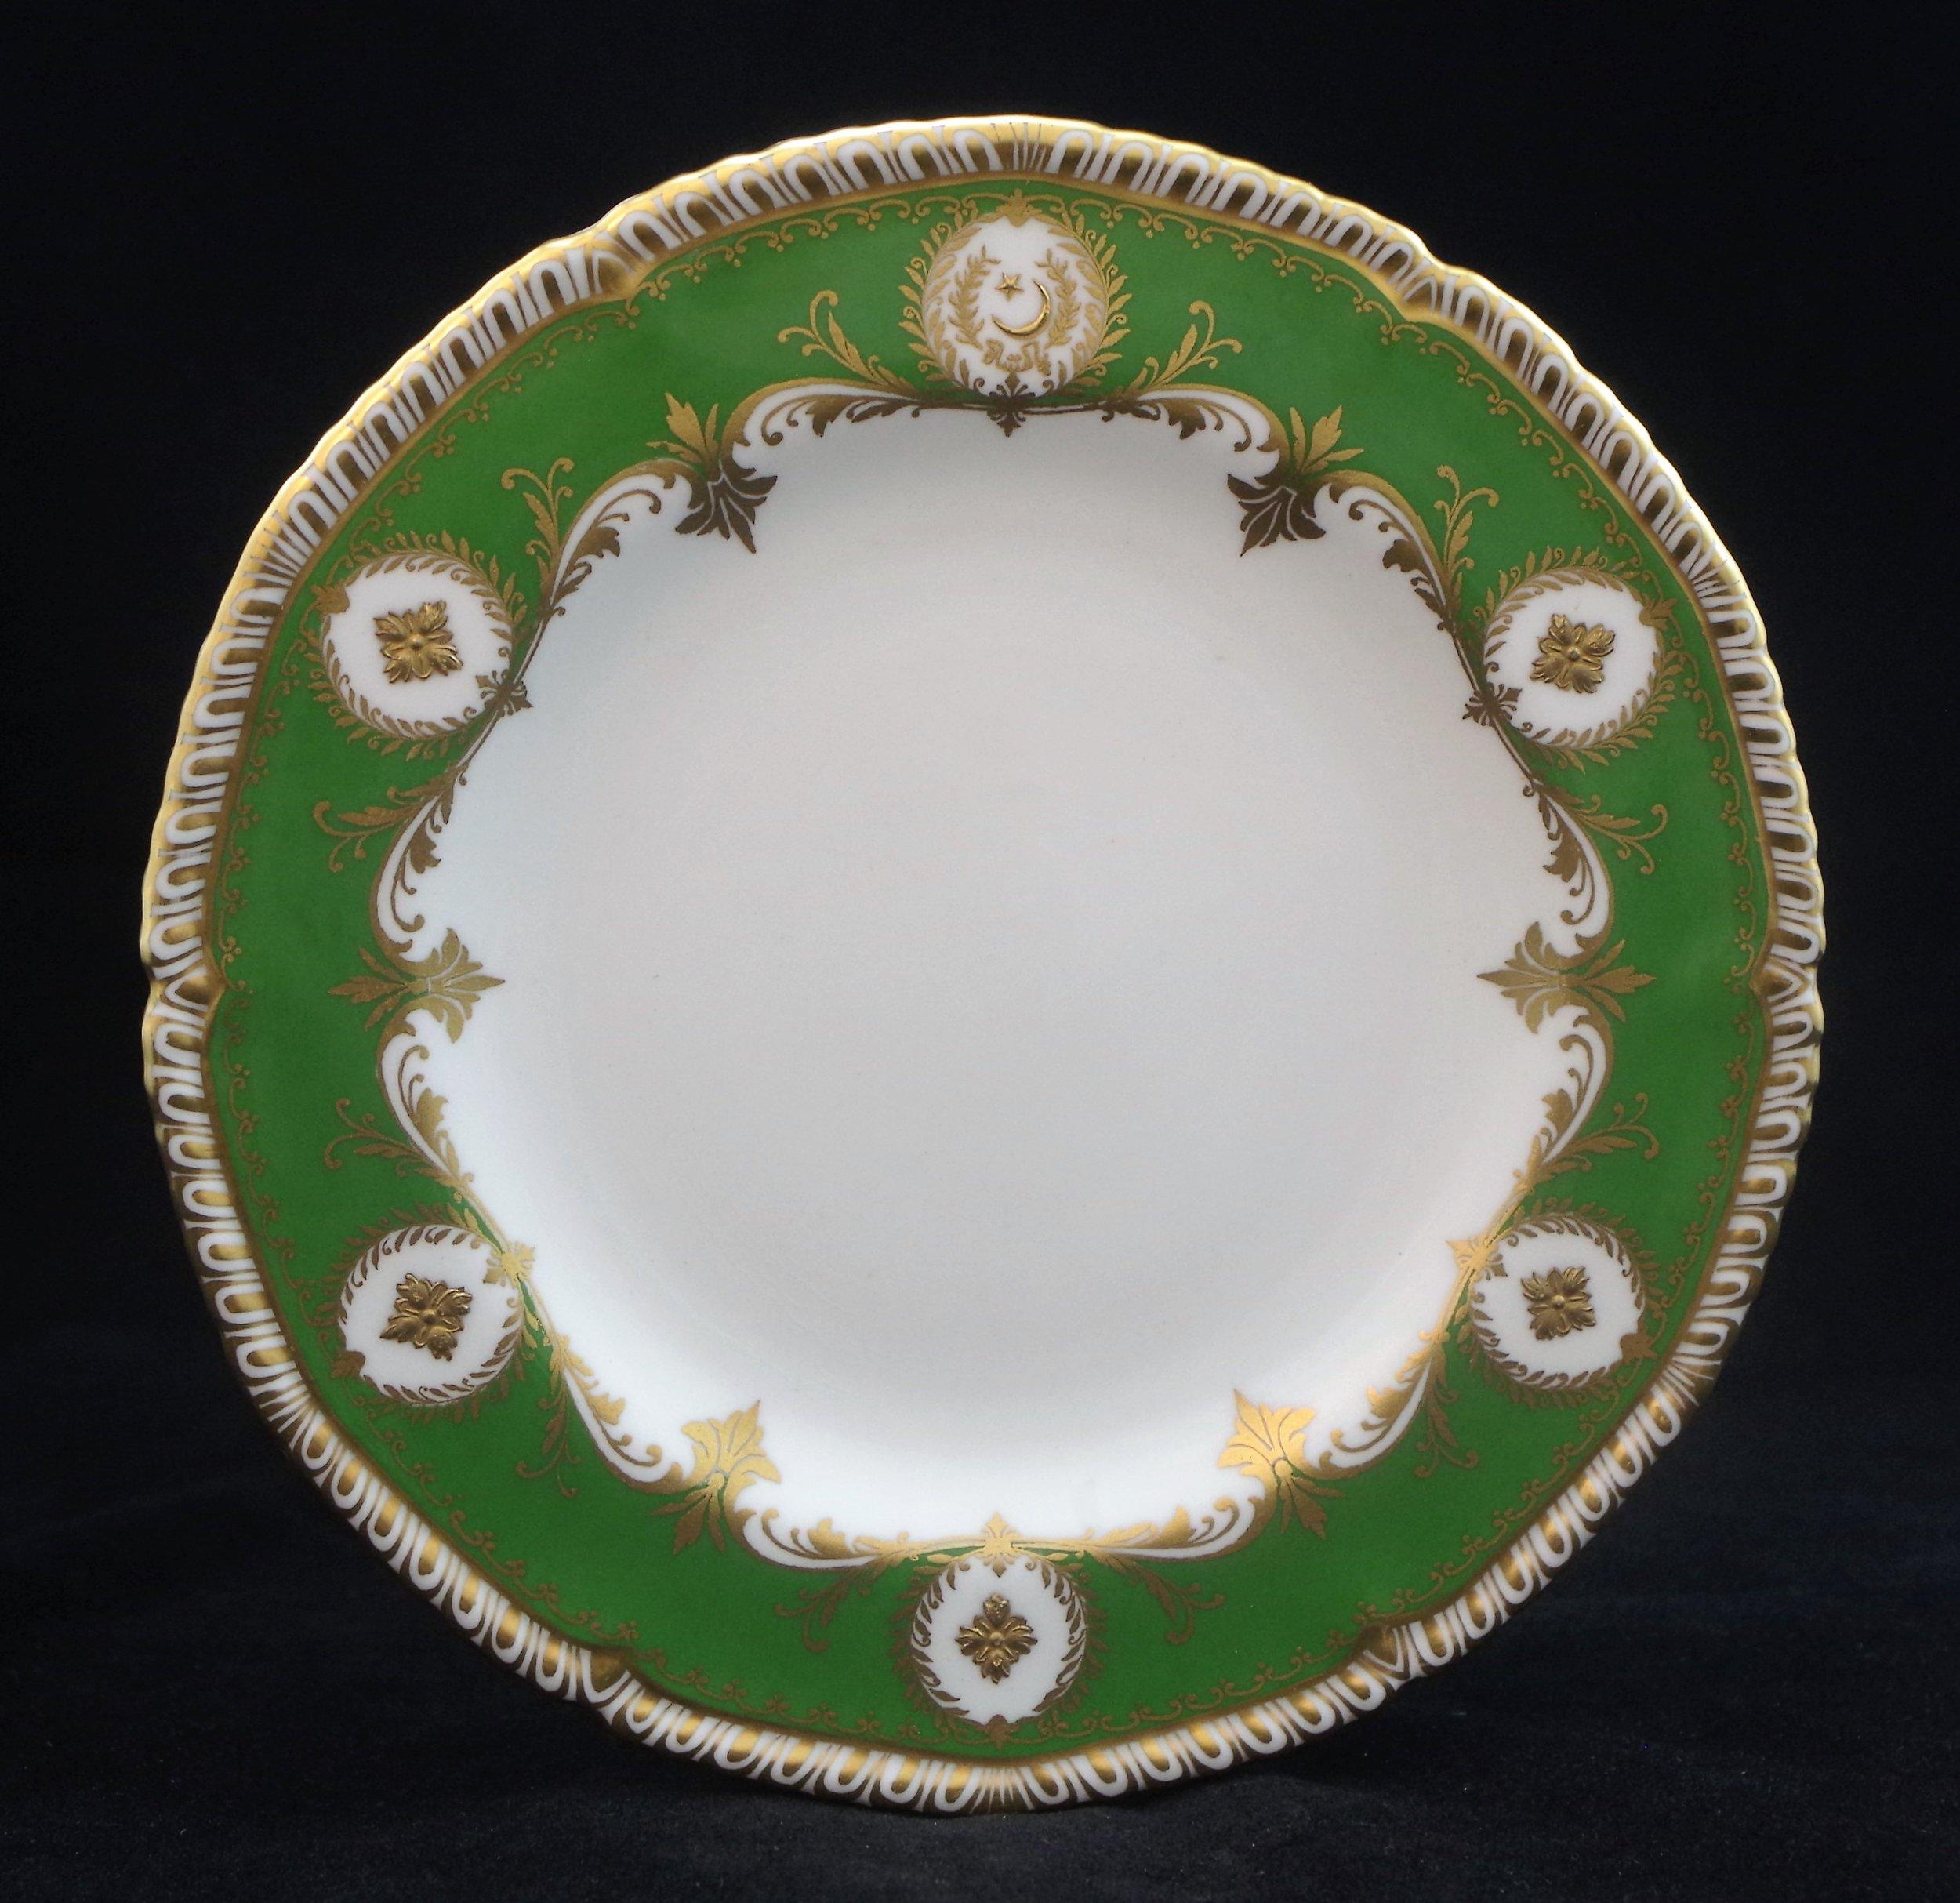 royal-crown-derby-queen's-gadroon-green-ground-pakistan